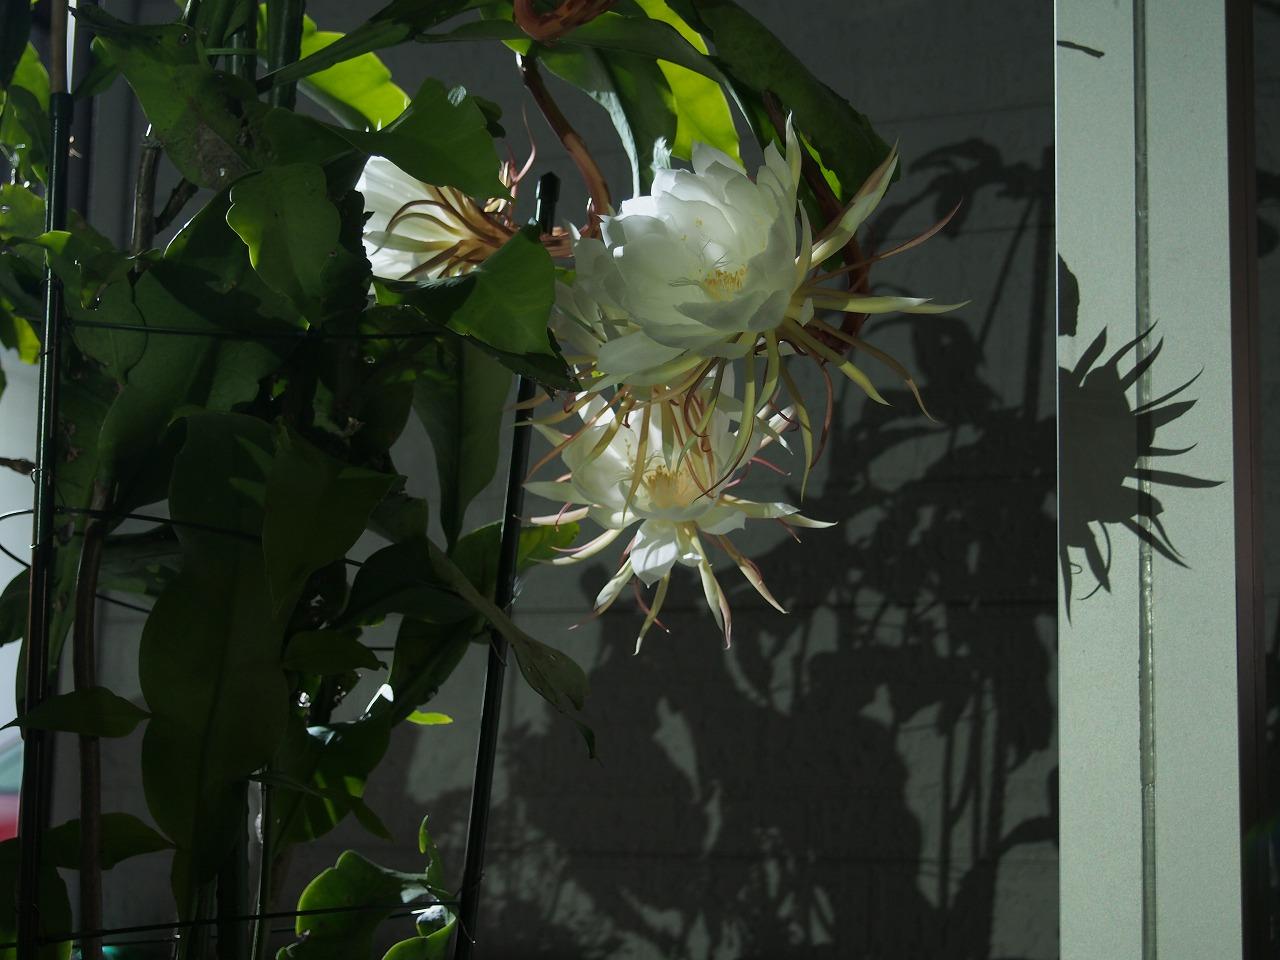 20160910-EpiphyllumOxpetalum-O05.jpg